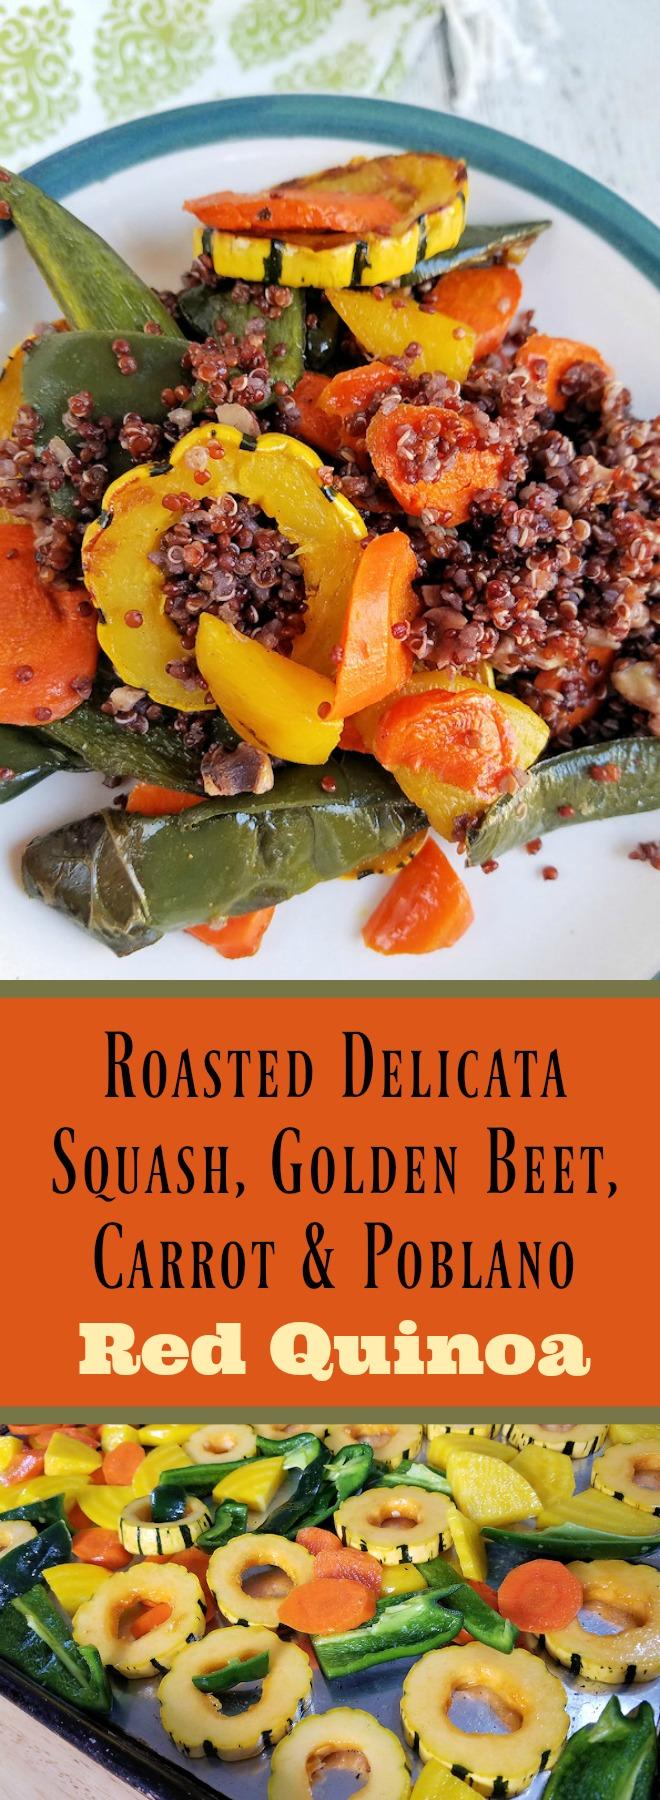 Roasted Delicata Squash, Golden Beet, Carrot & Poblano Red Quinoa Recipe